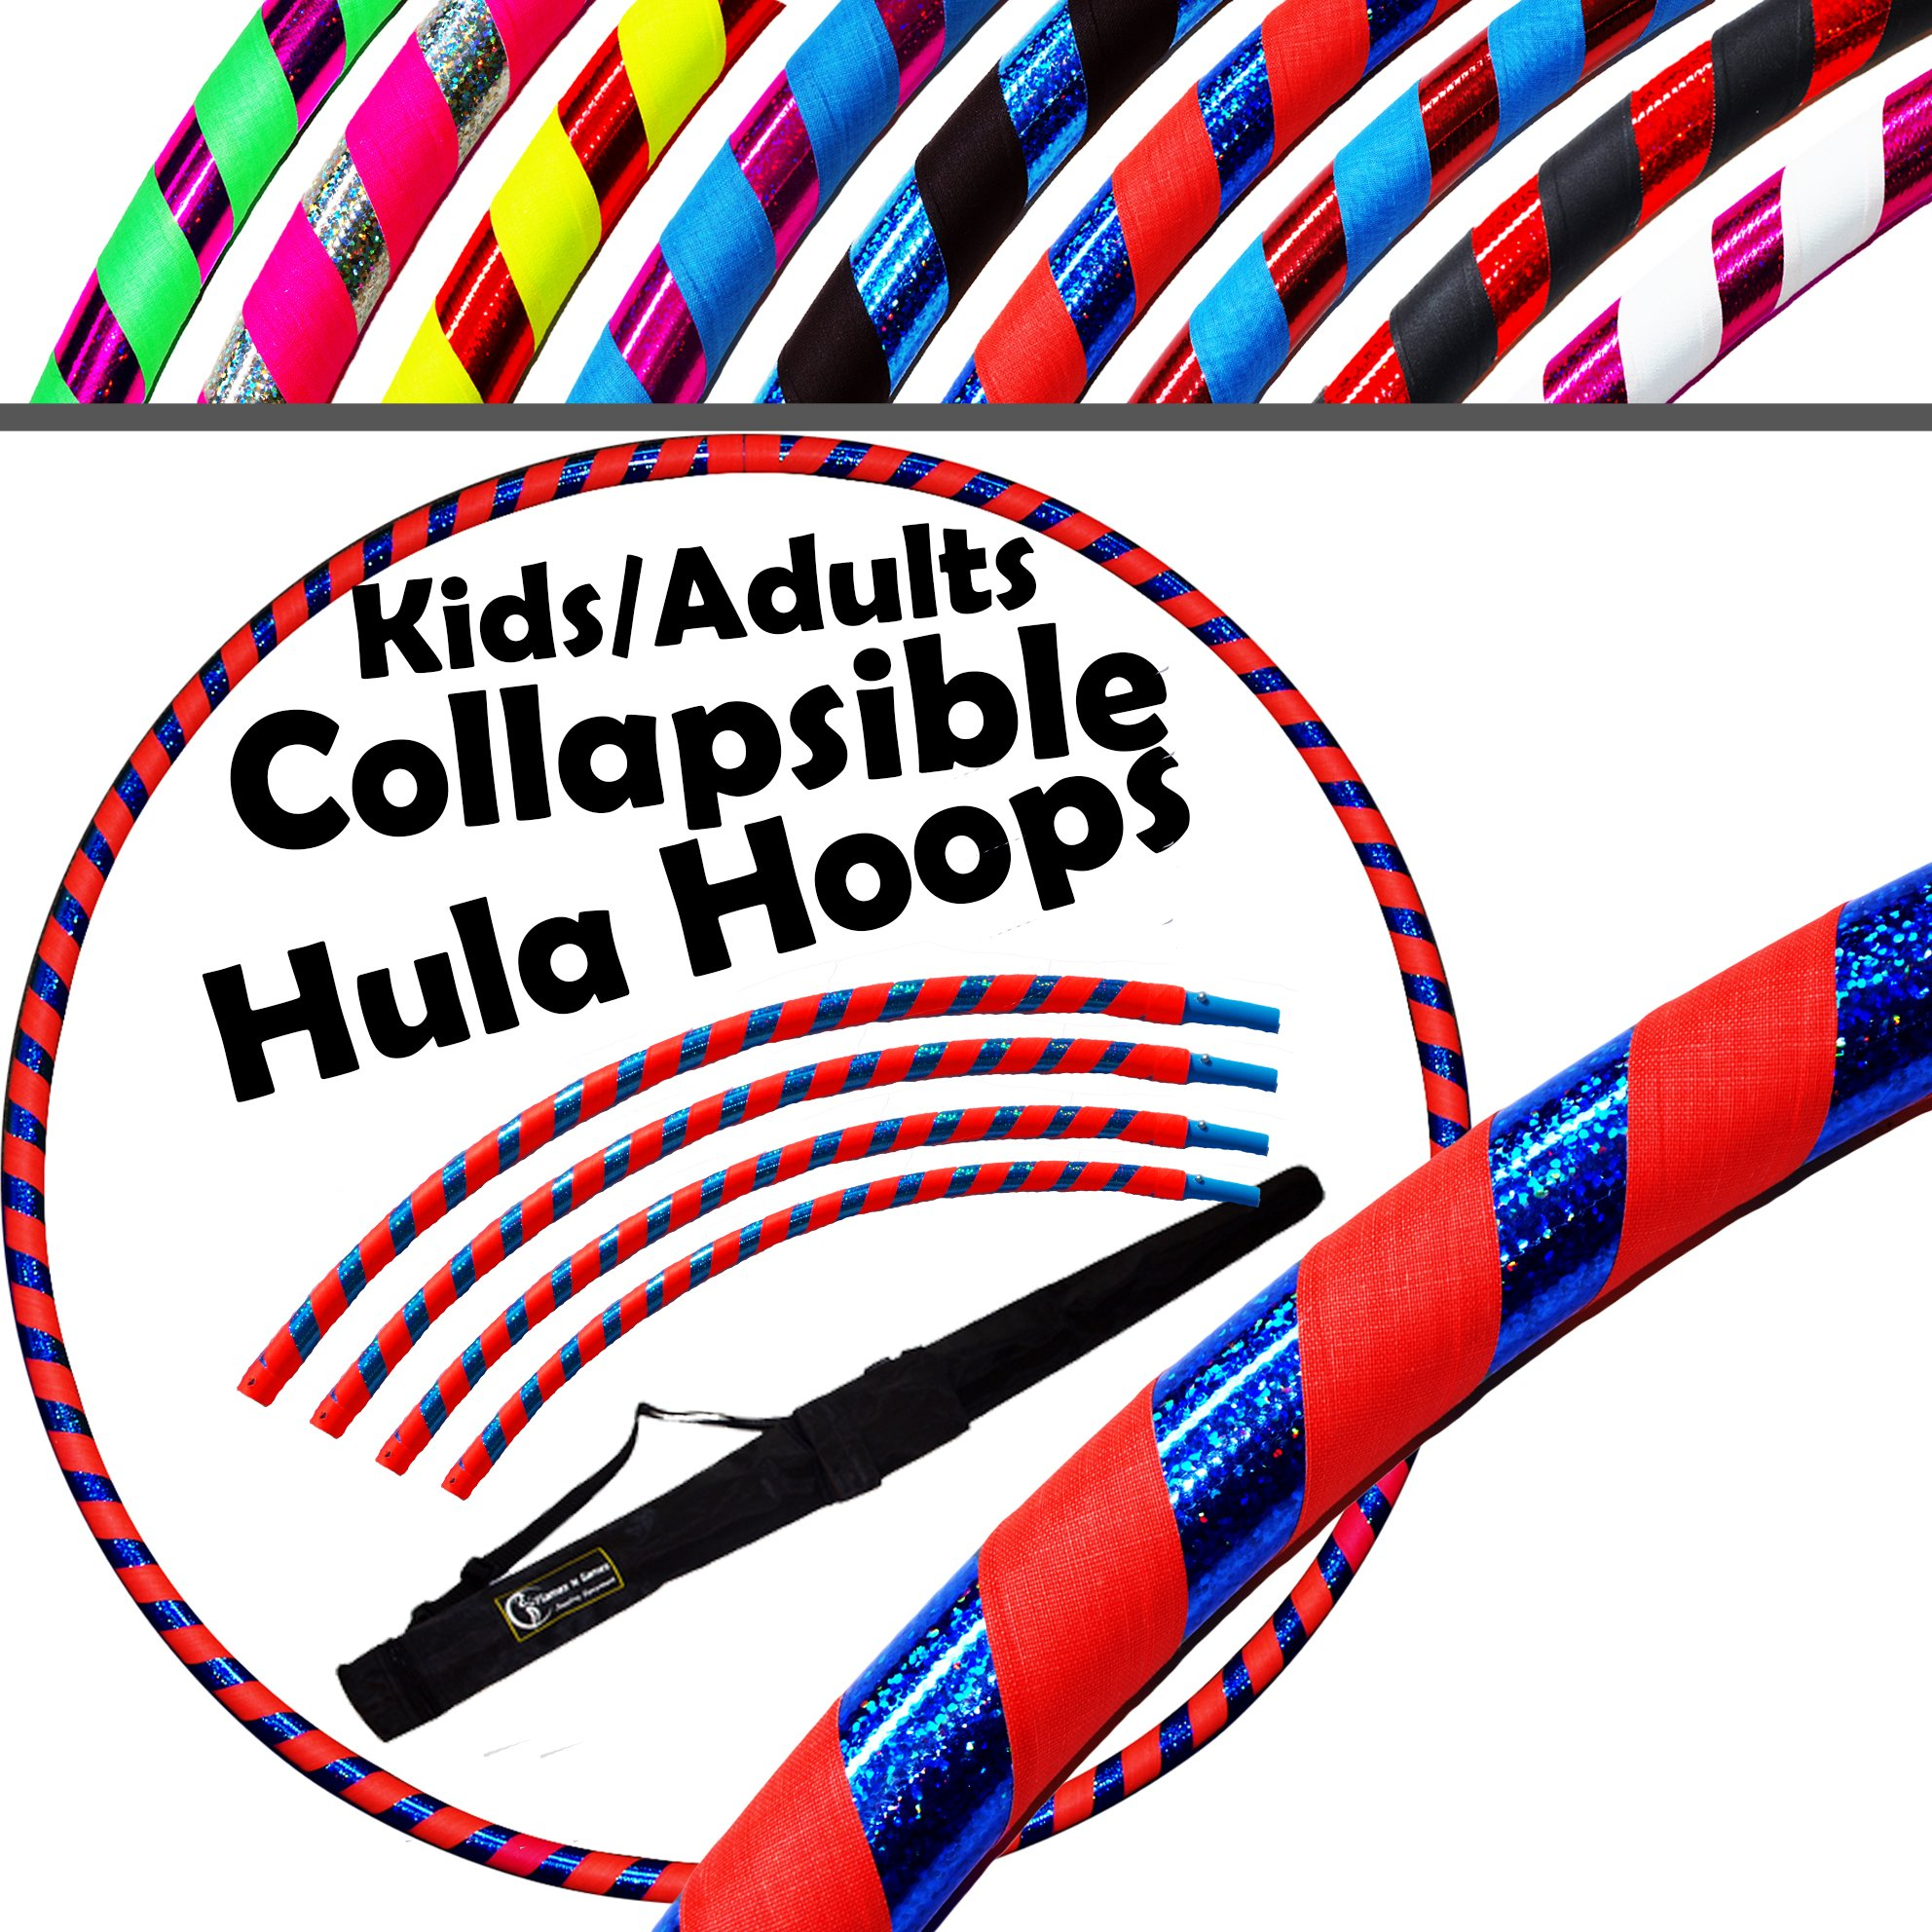 PRO Kids Hula Hoops COLLAPSIBLE (Ultra-Grip/Glitter Deco) Hula Hoop + Carry Bag! (85cm/33.5'') Hoola Hoops For Exercise, Dance & Fitness! (600g / 21.2oz) (Orange / Blue Glitter)